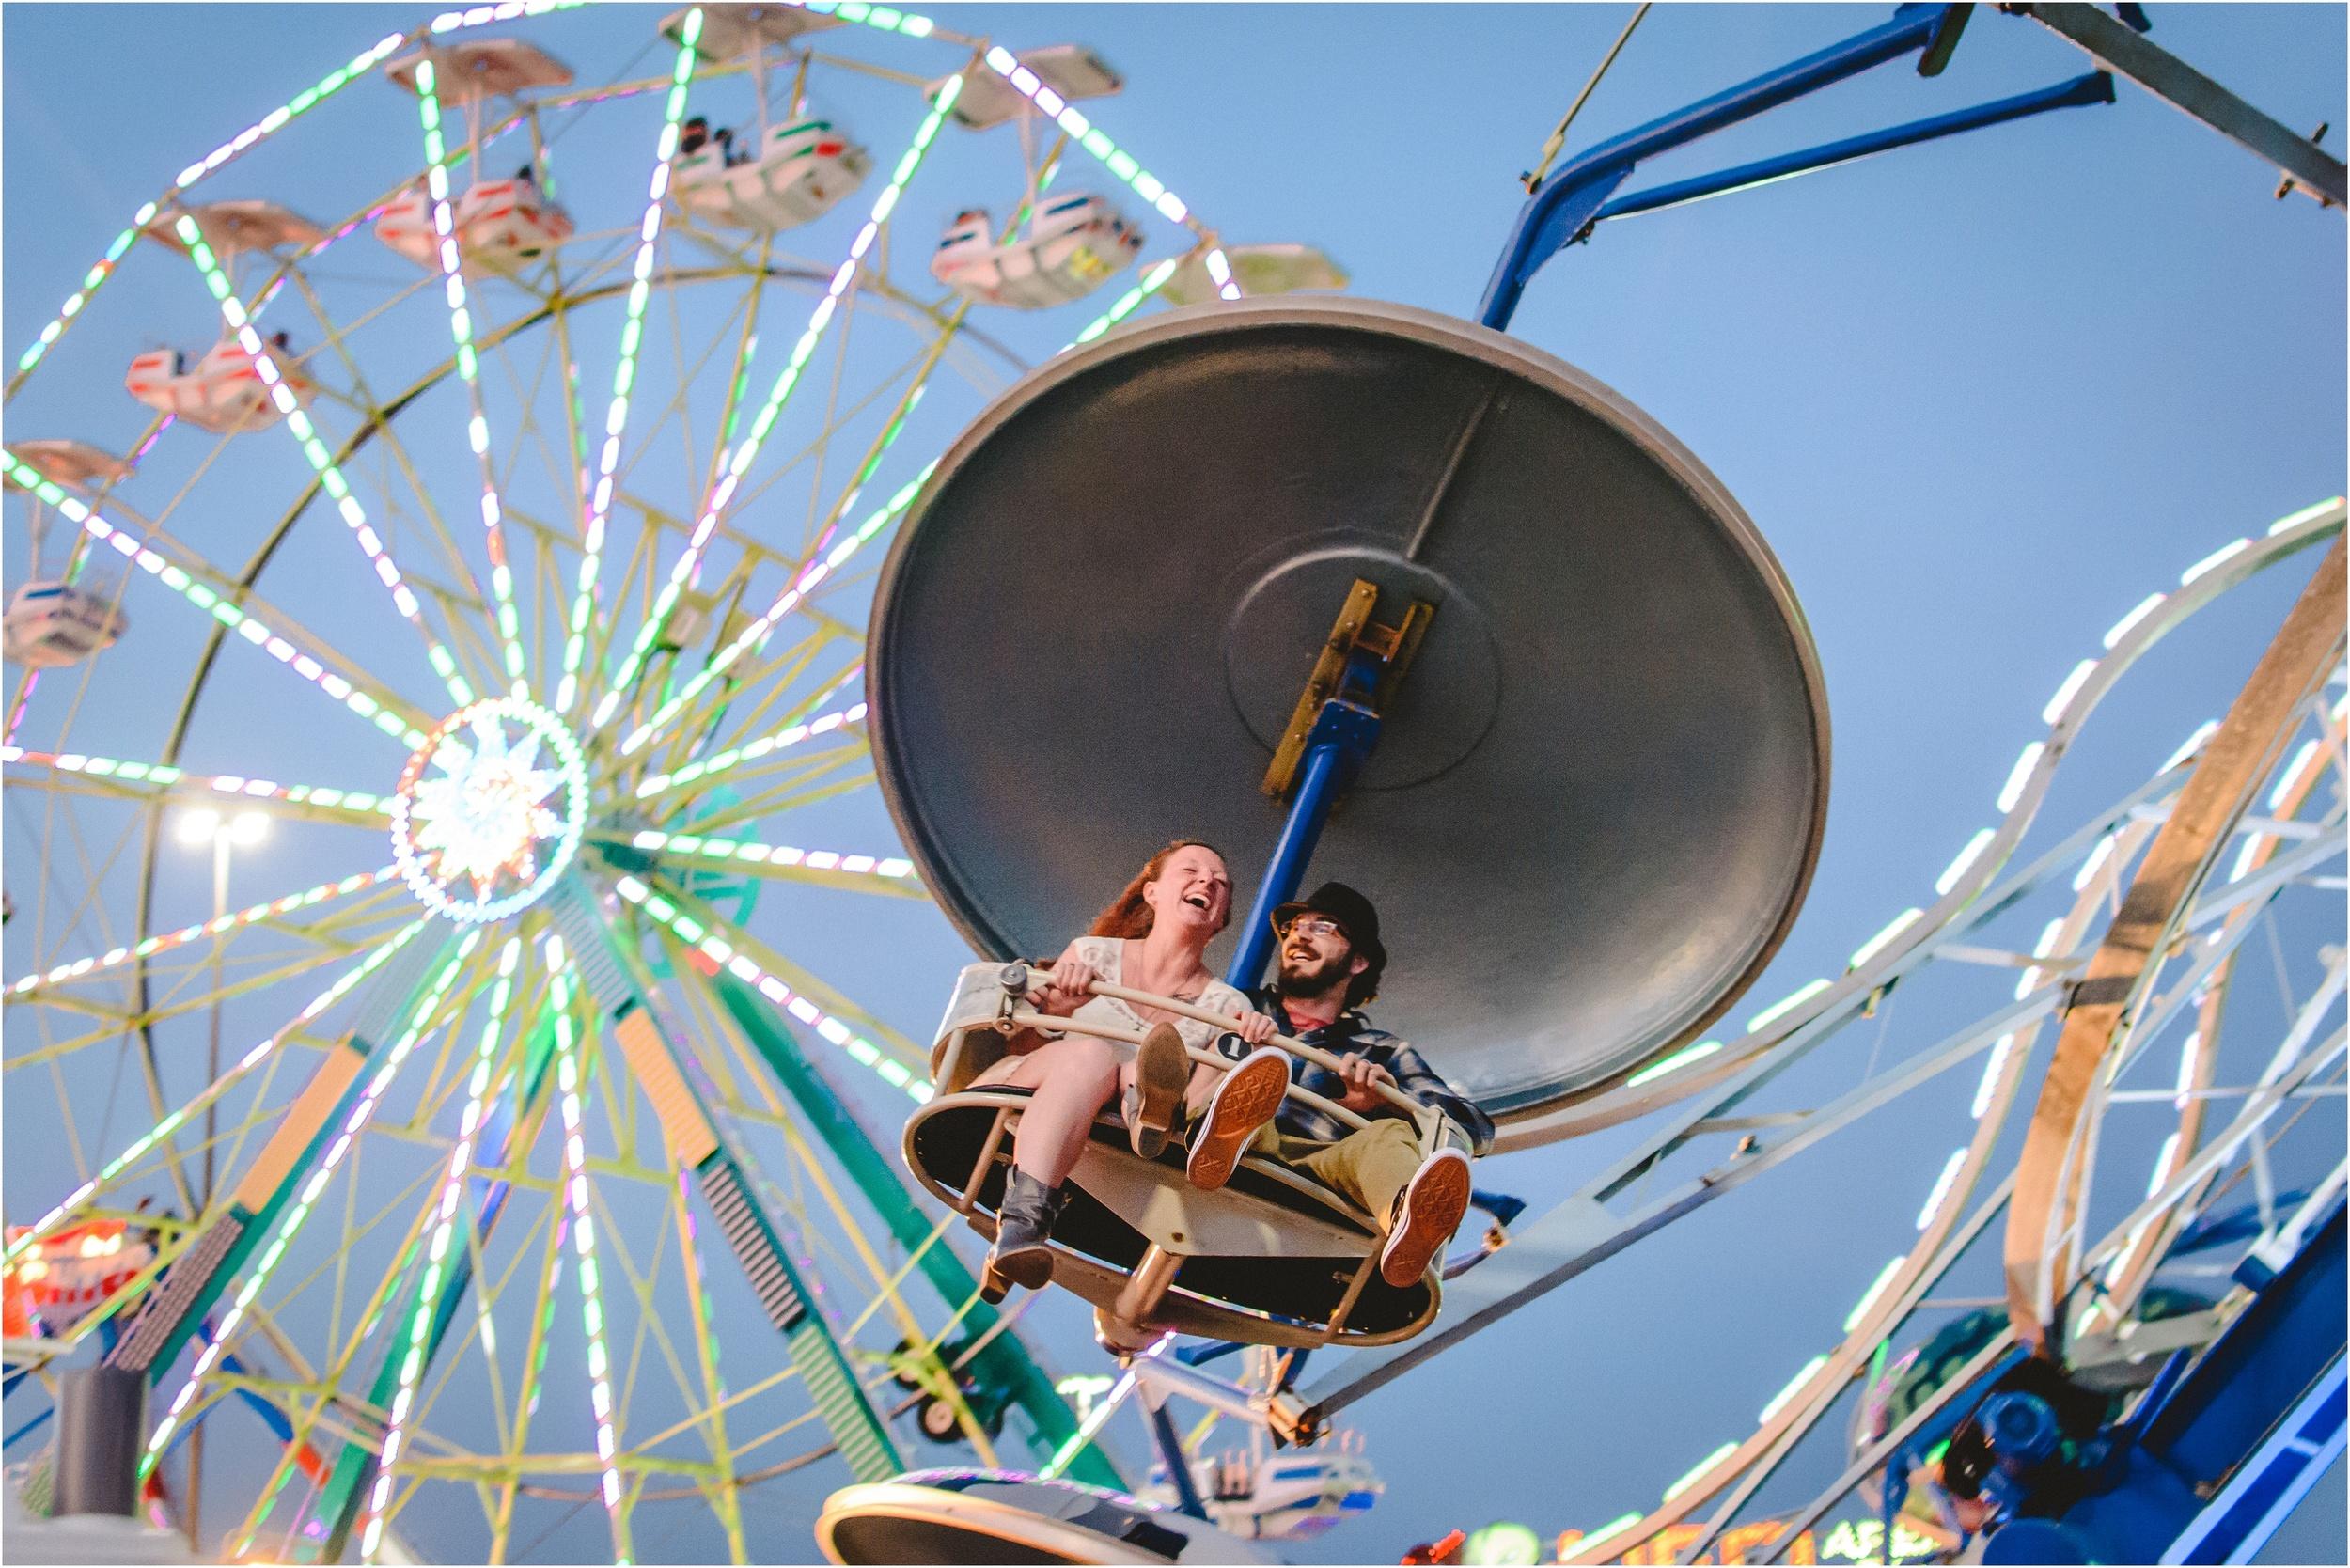 bnp-sebecks-carnival